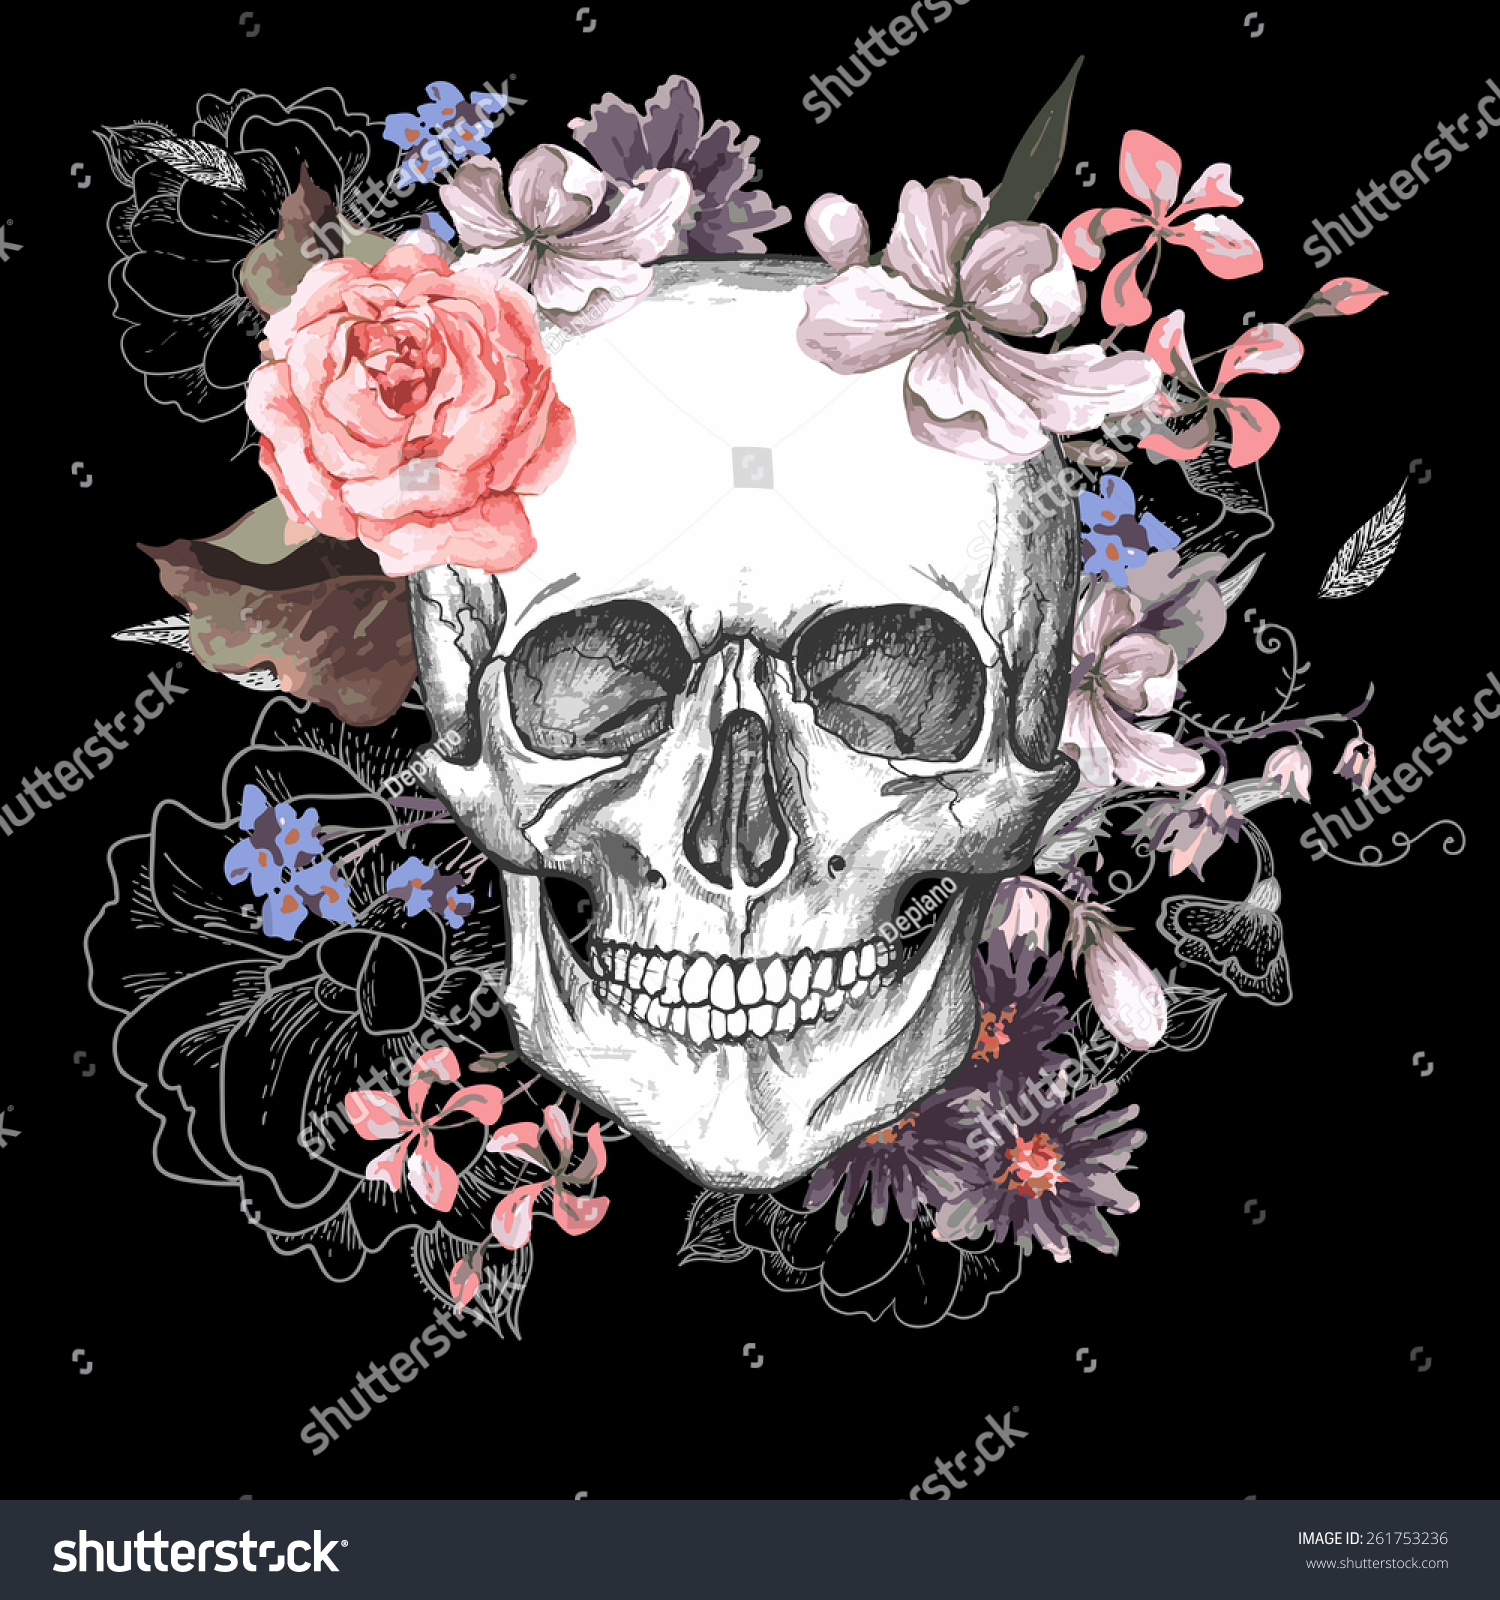 Skull Flowers Day Dead Vintage Vector Stock Vector Shutterstock